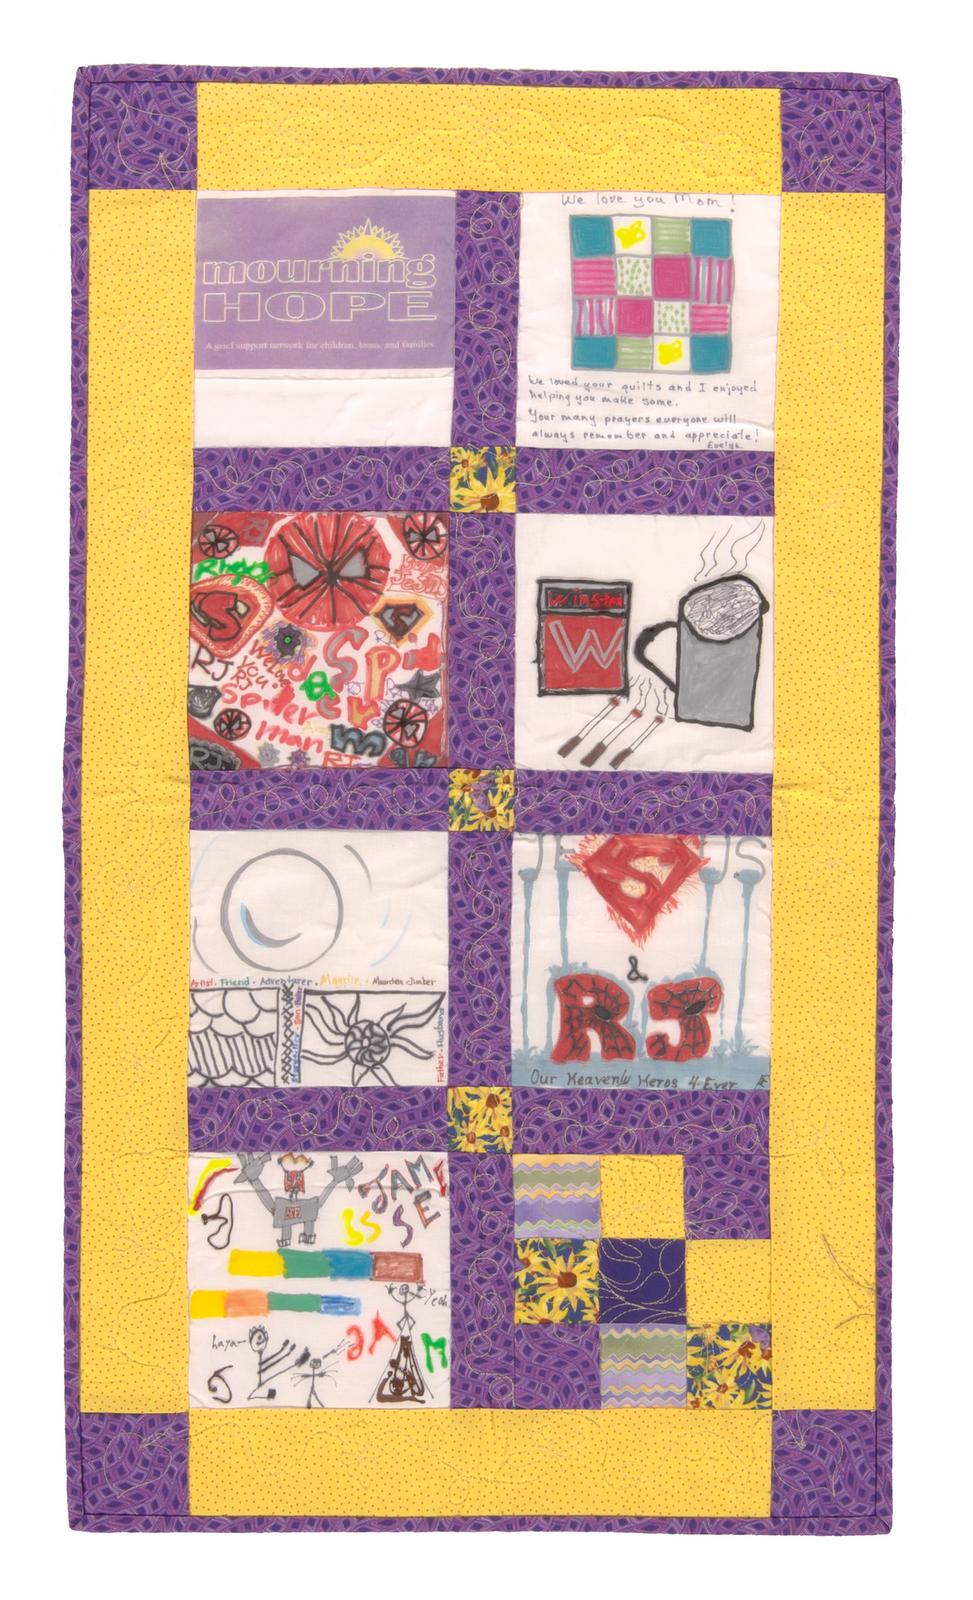 2009 Spring Quilt 2